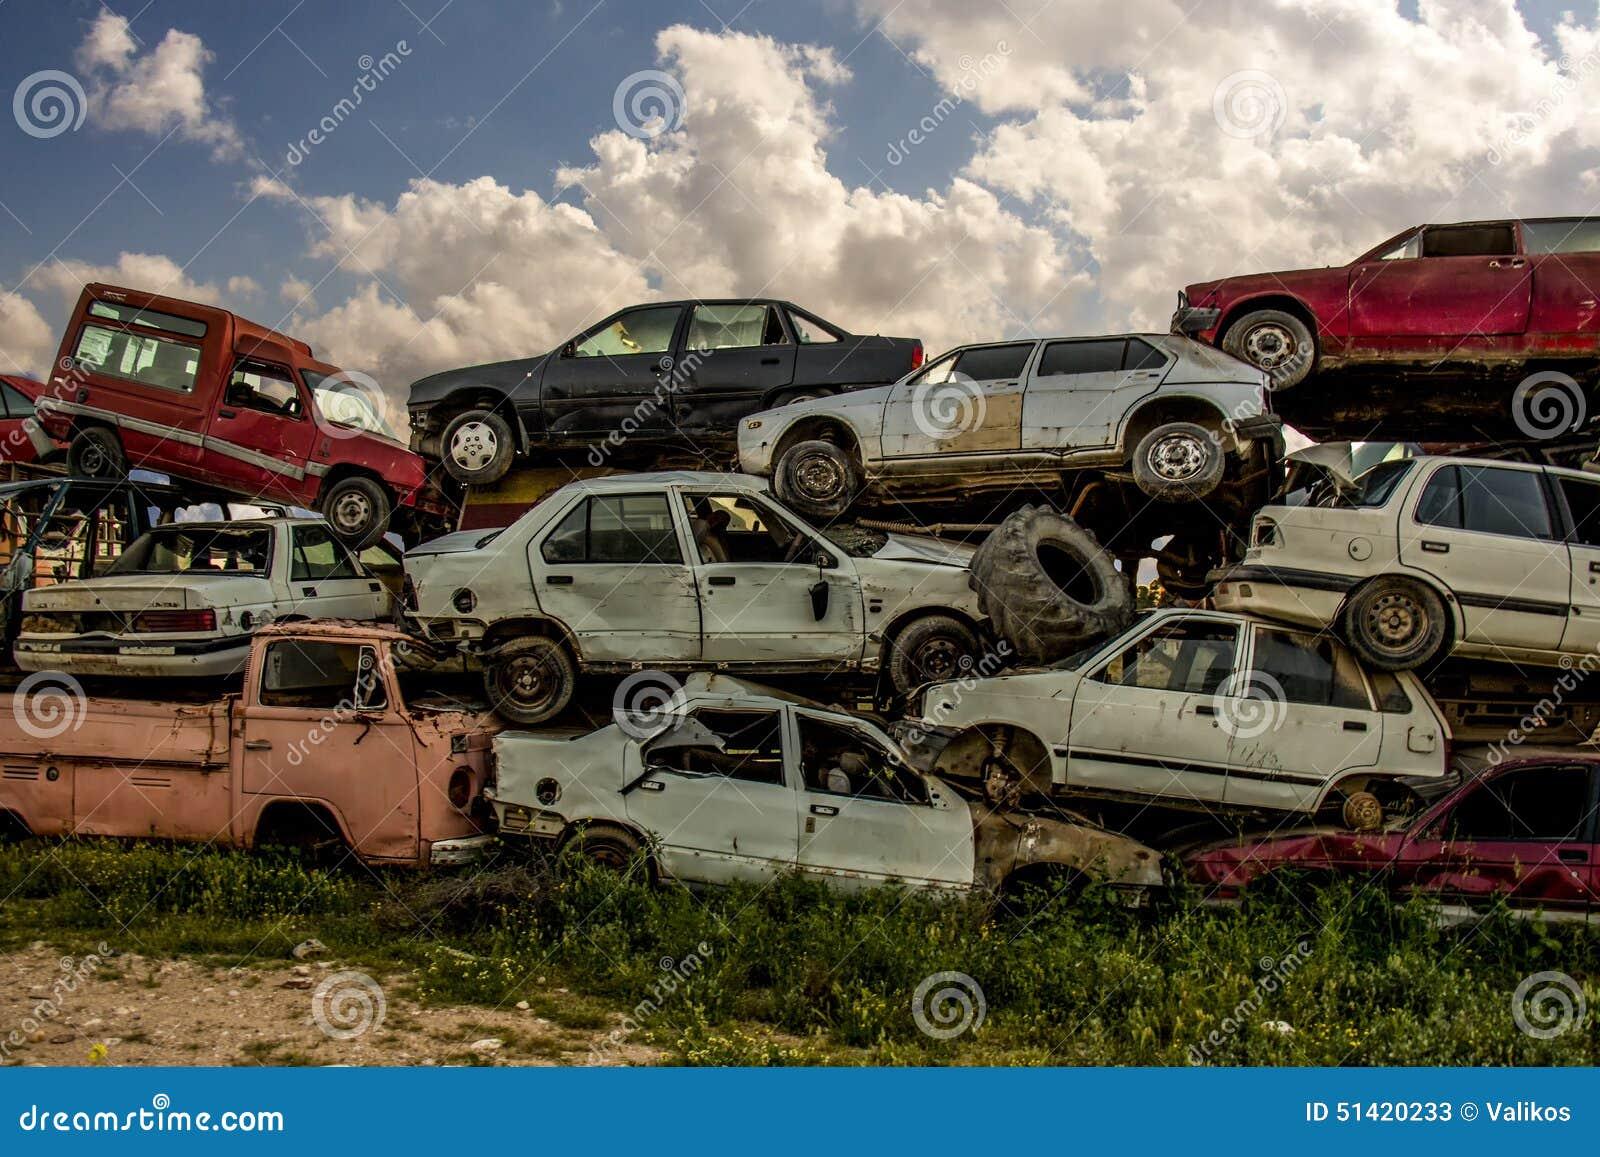 How To Recyce Broken Car Parts